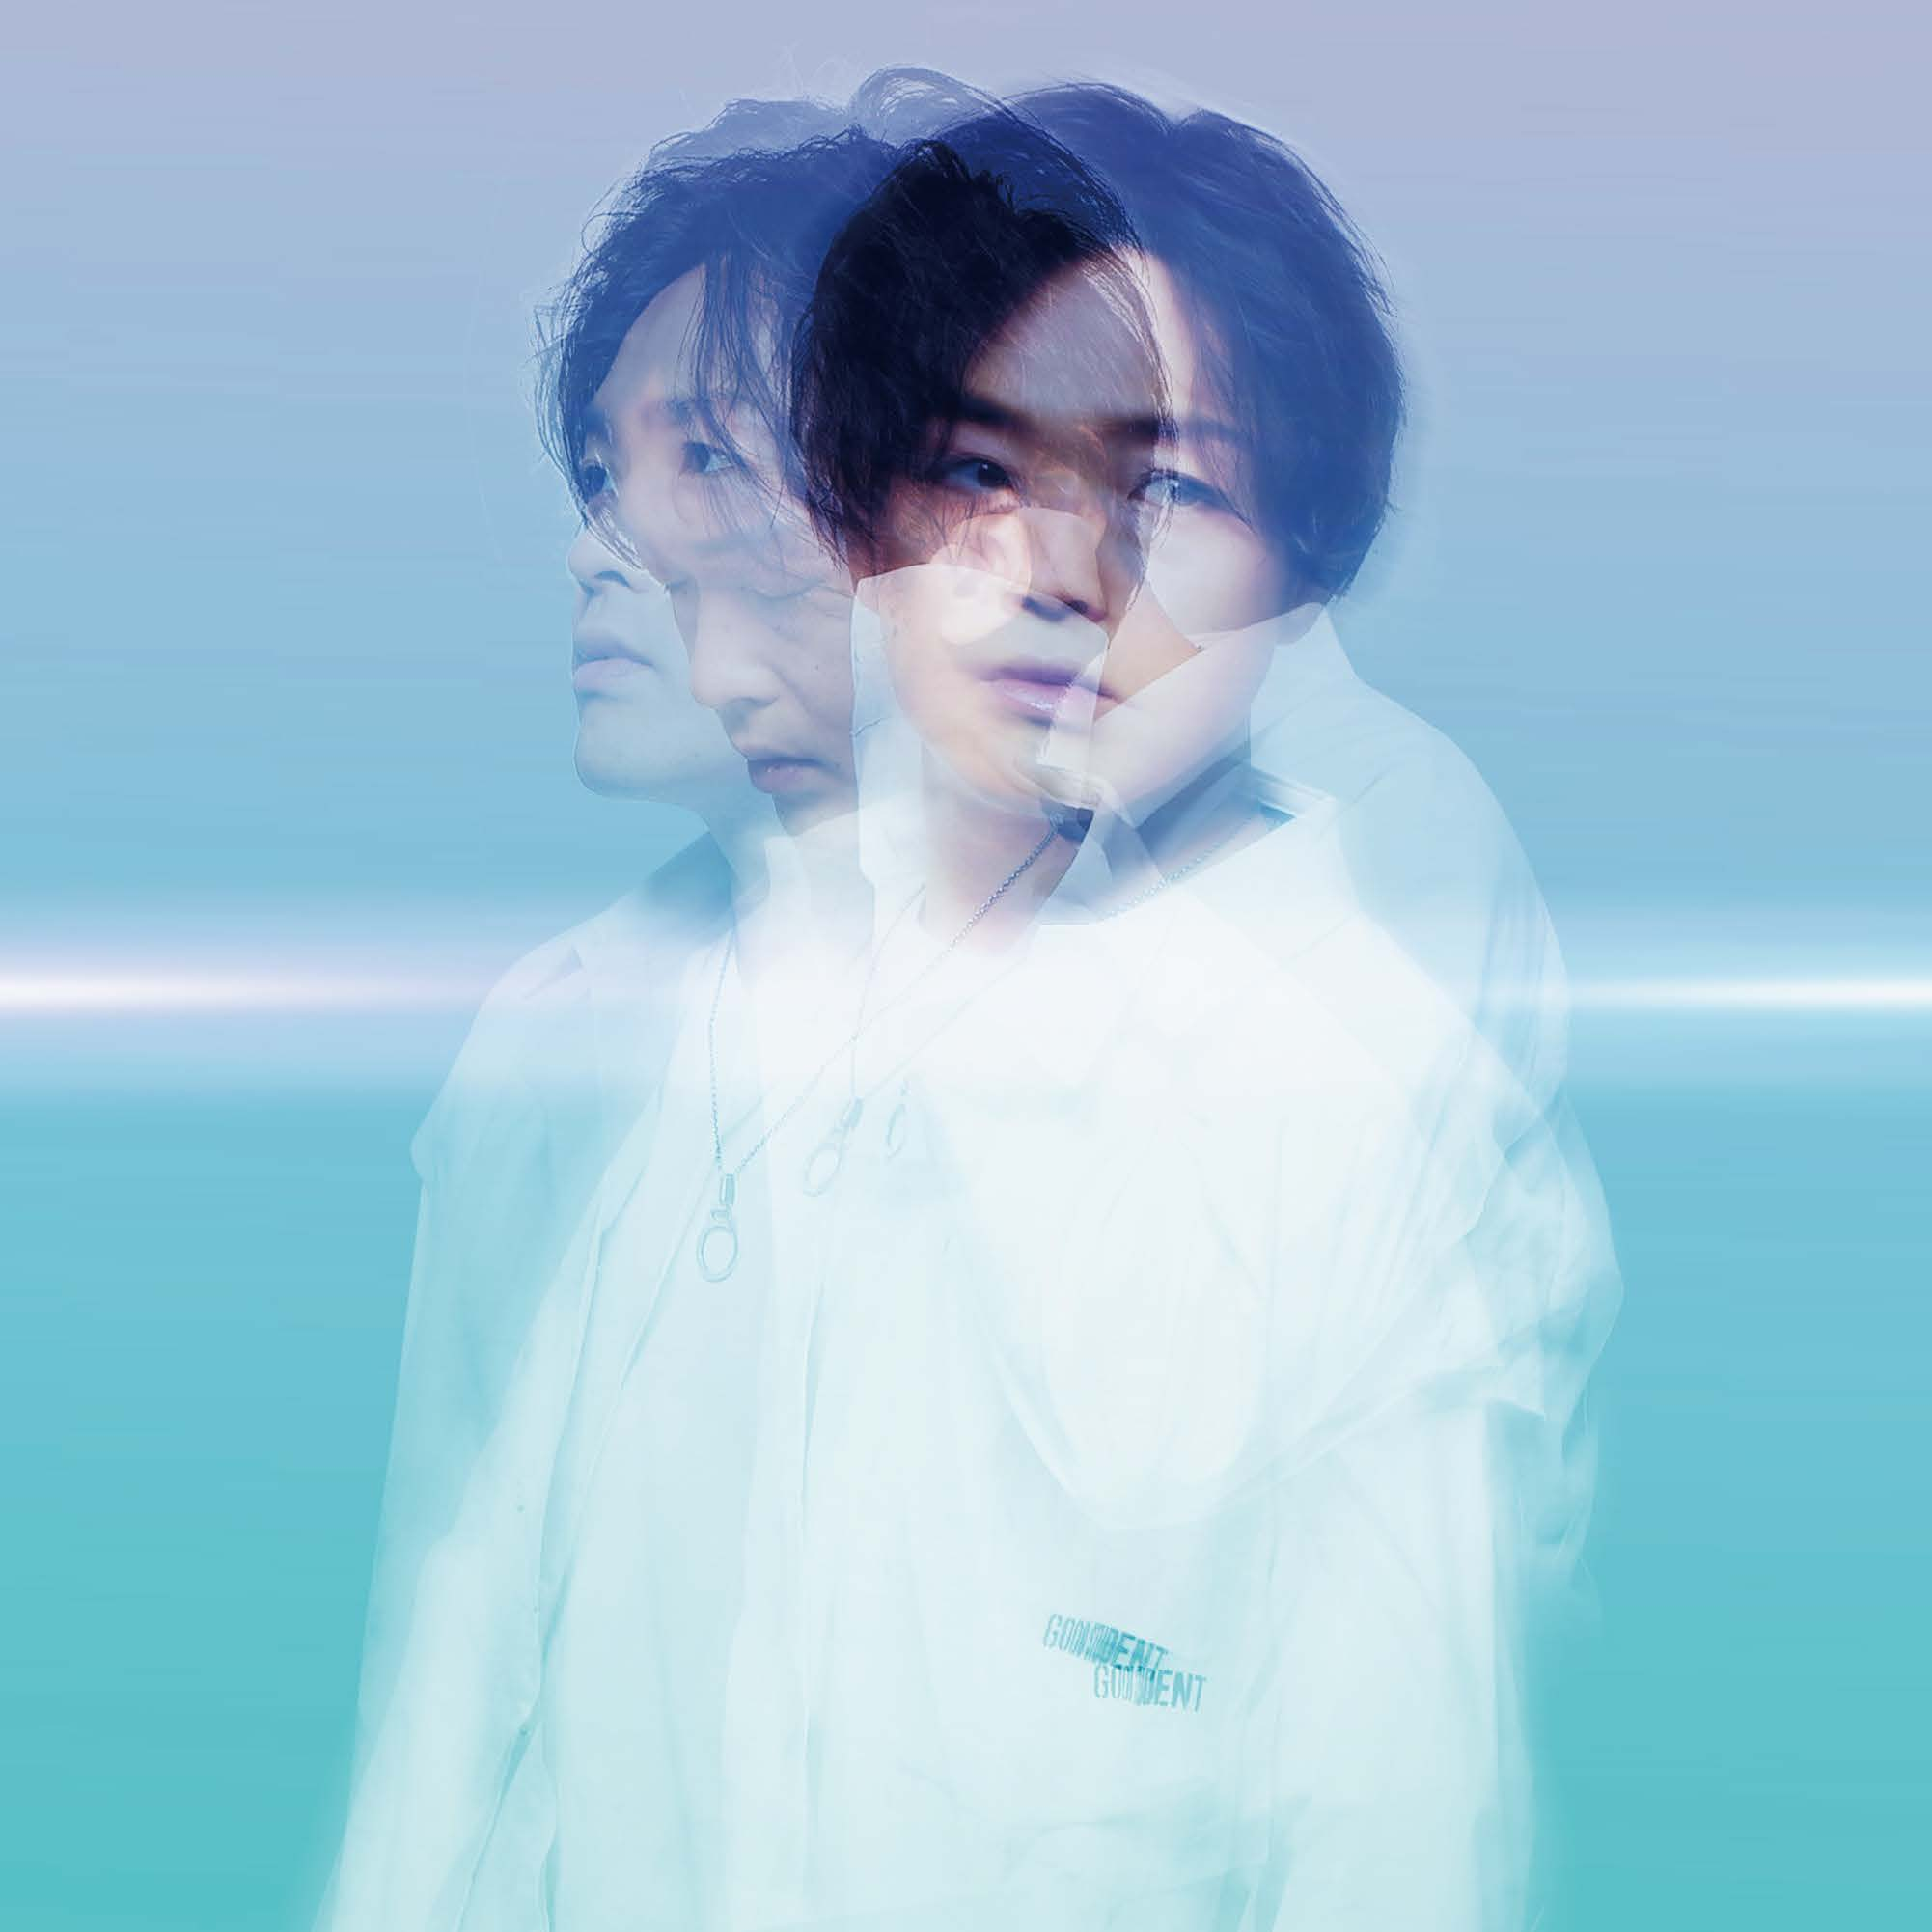 佐藤広大 KODAI SATO LIVE TOUR 2019 RUN (Concert Live) @ 函館 Club COCOA